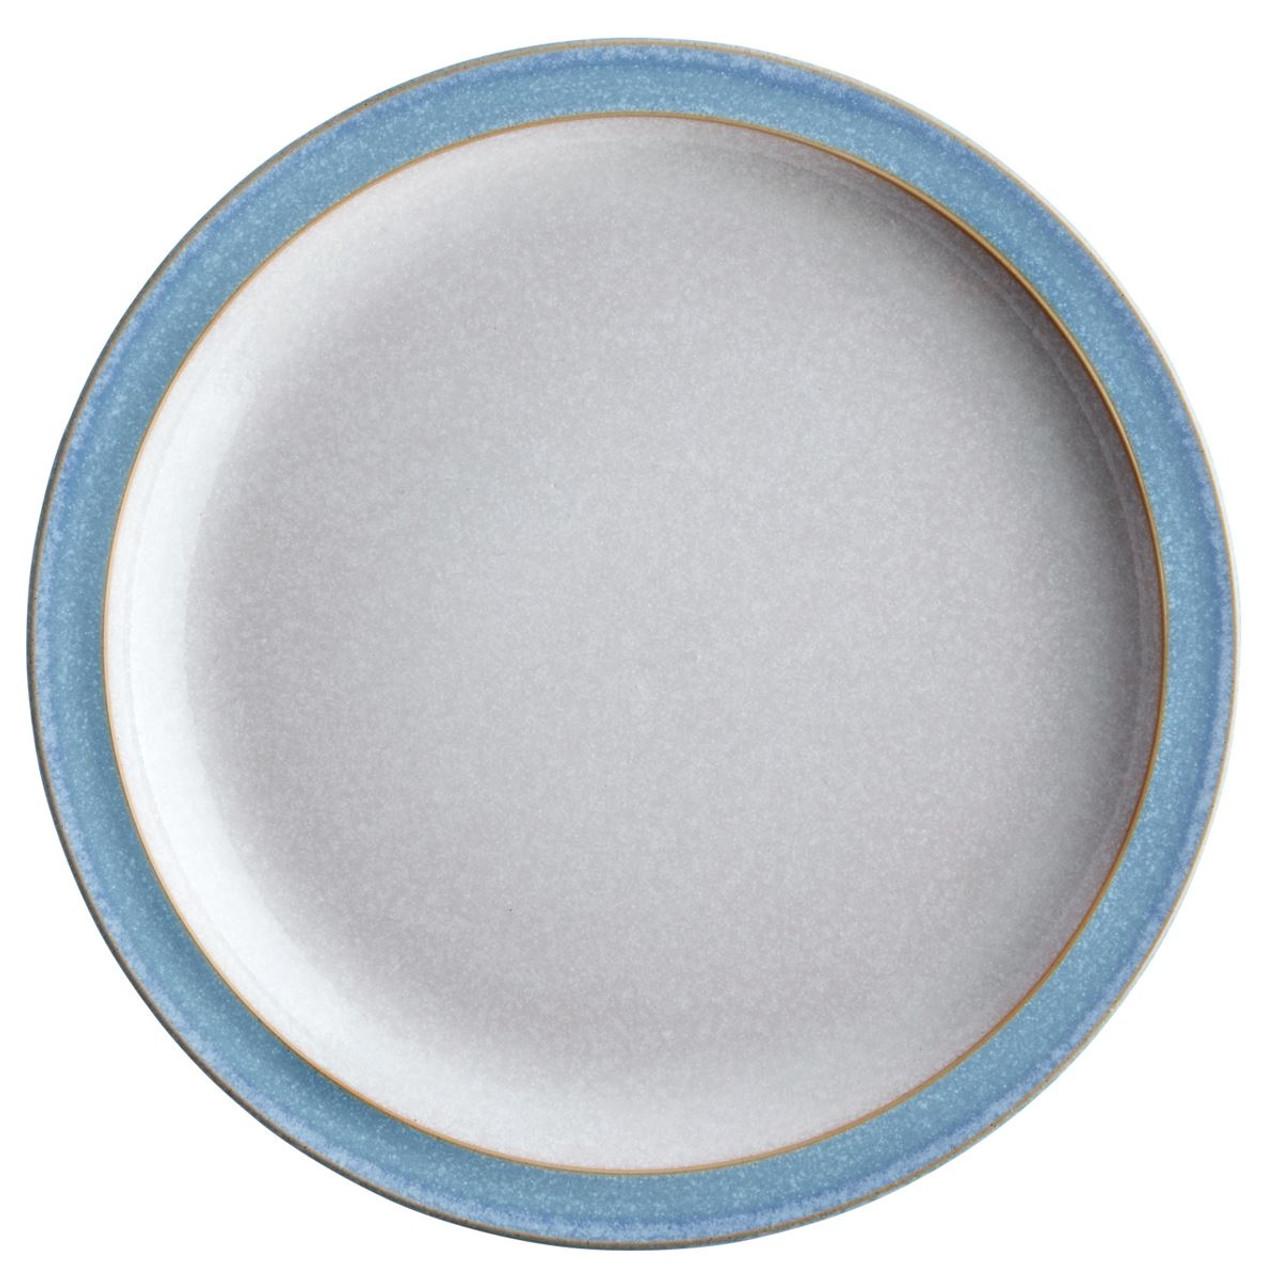 Denby Elements Light Blue Small Plate